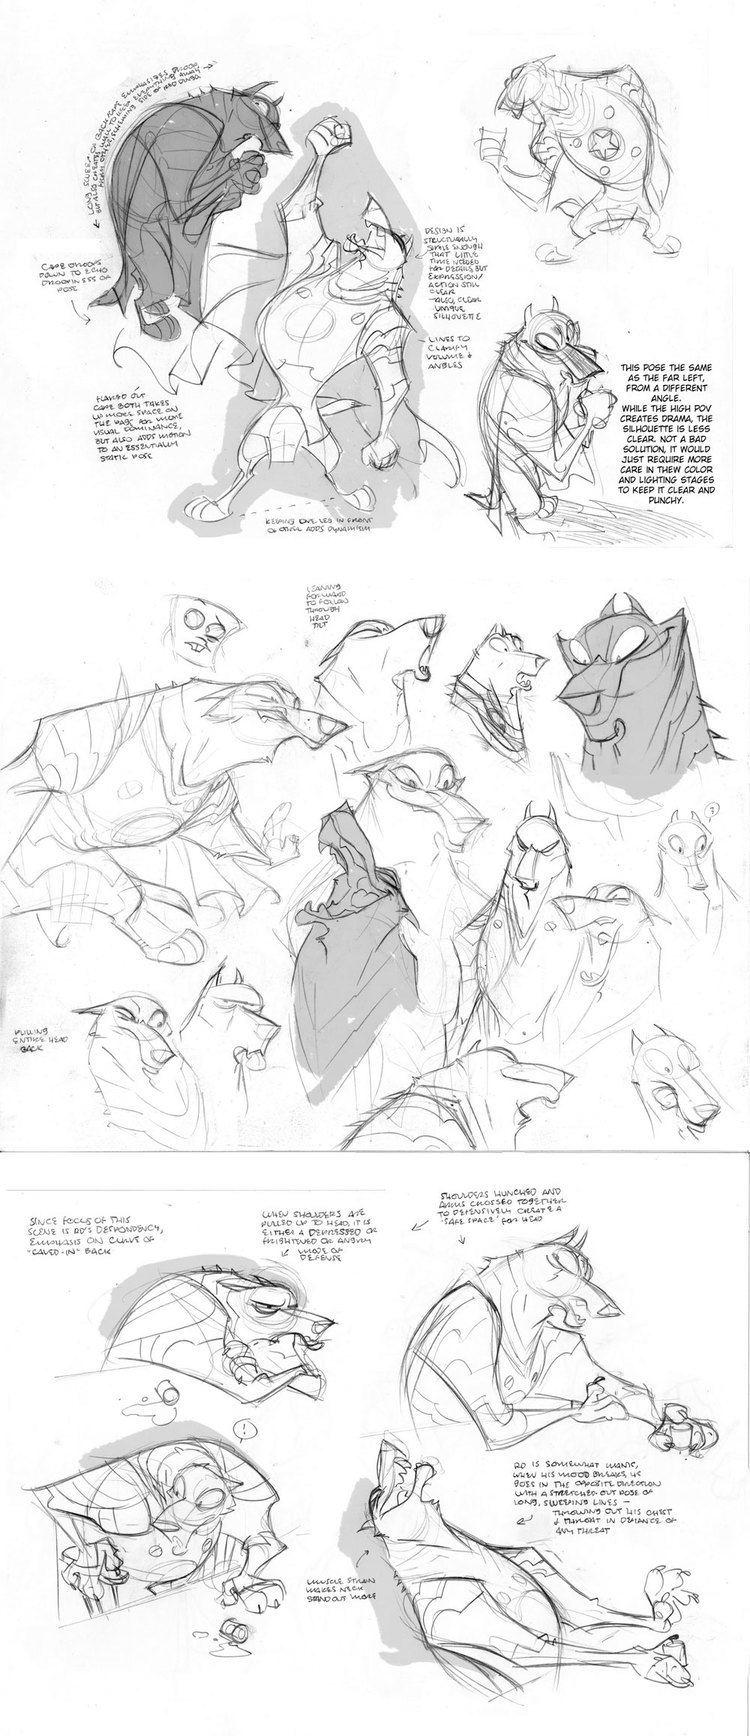 Ben Caldwell (cartoonist) Cartoons e dicas de Ben Caldwell THECAB The Concept